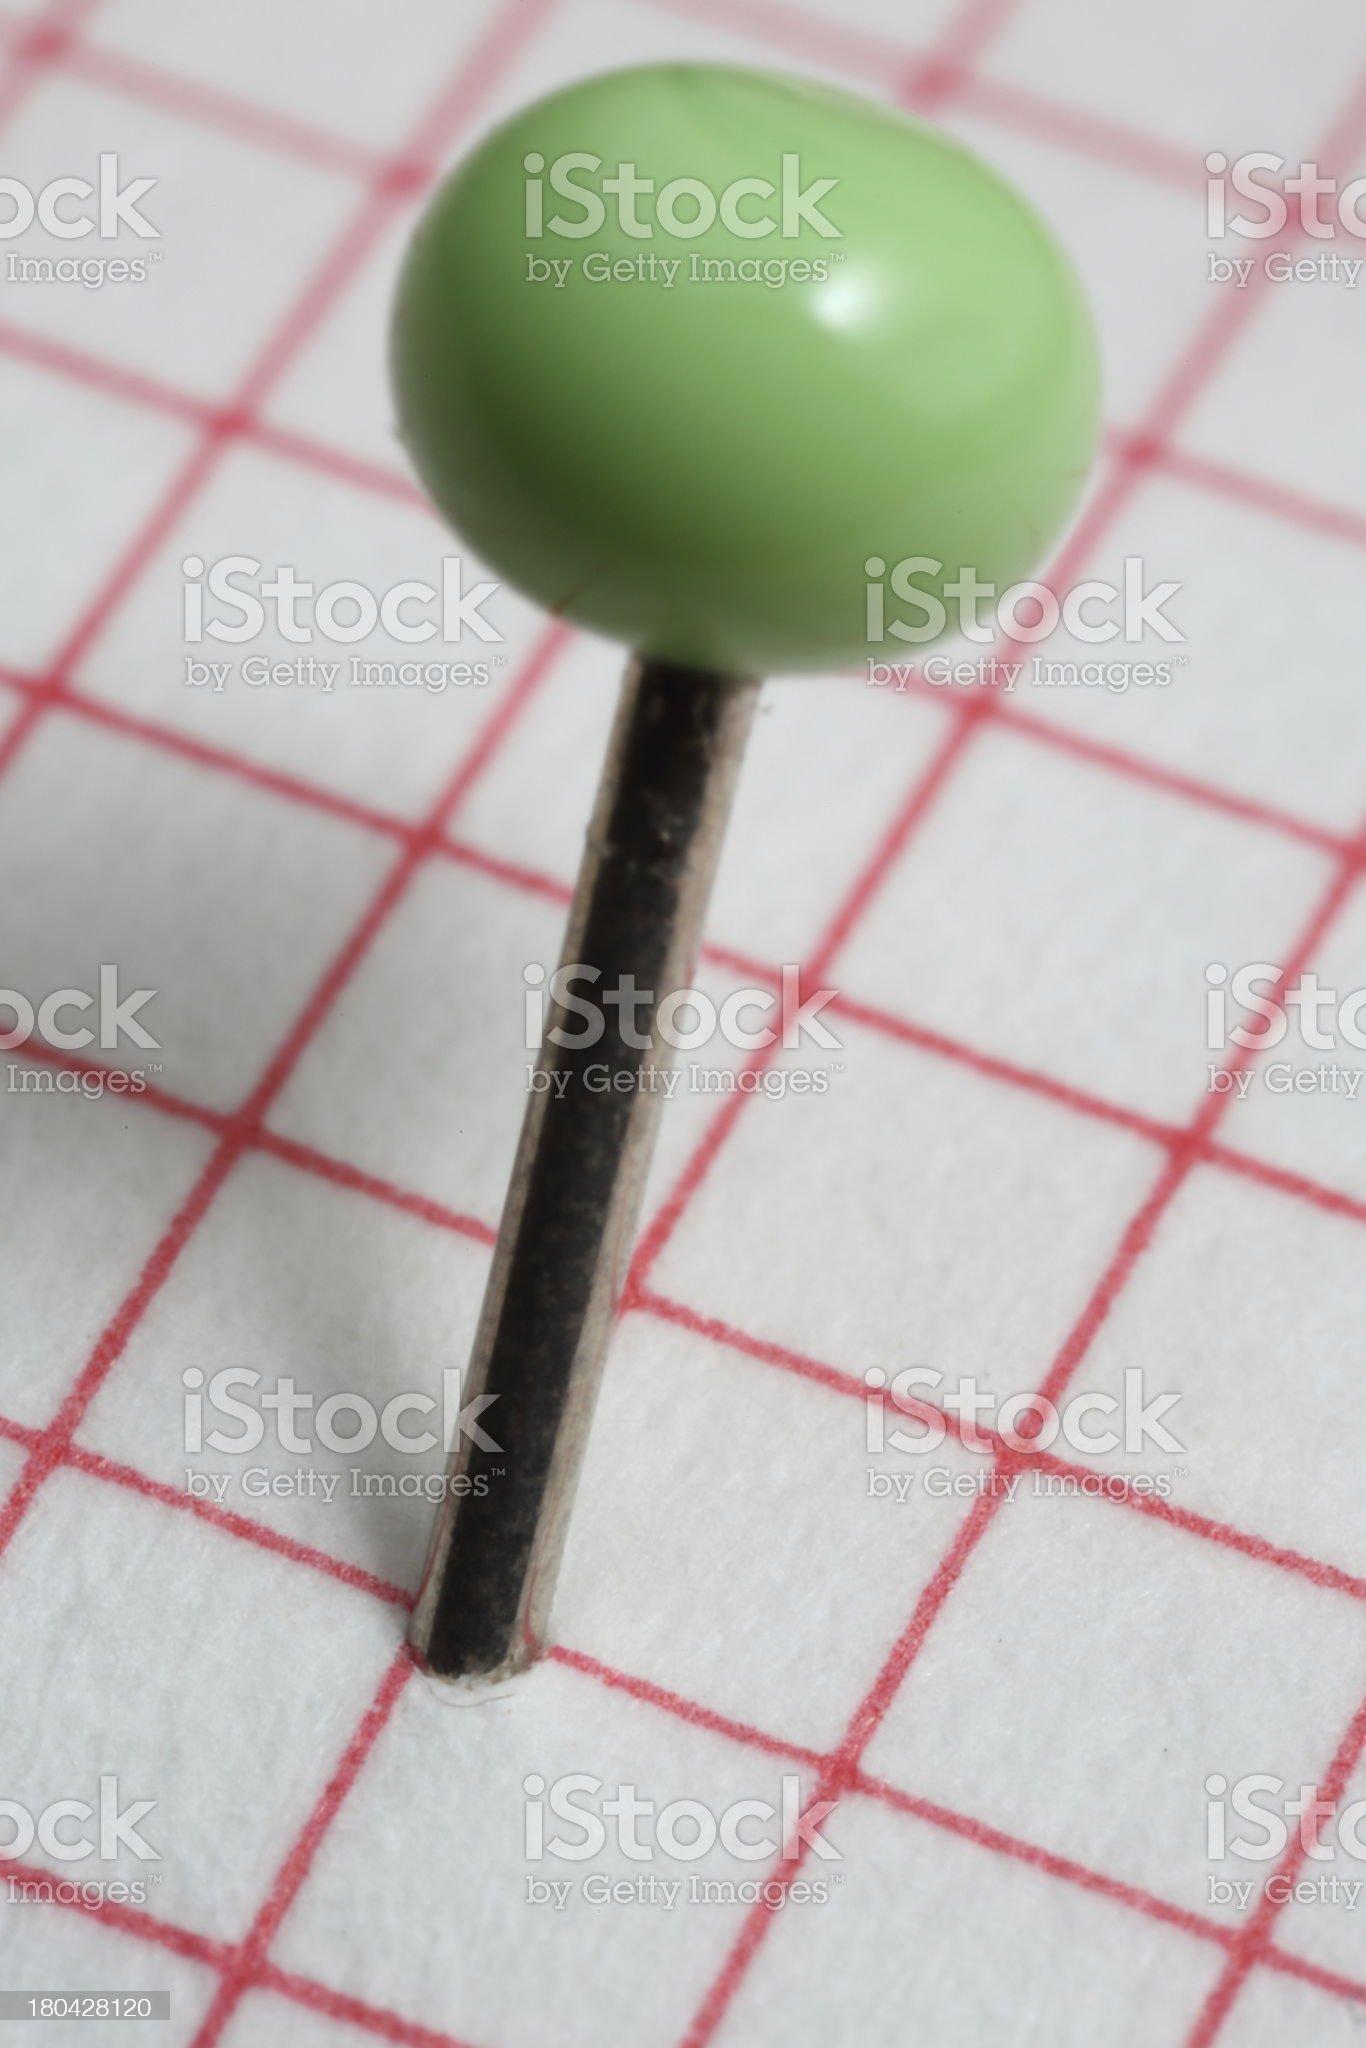 Macro (close-up) of Green Pushpin (thumbtack) isolated on squares royalty-free stock photo